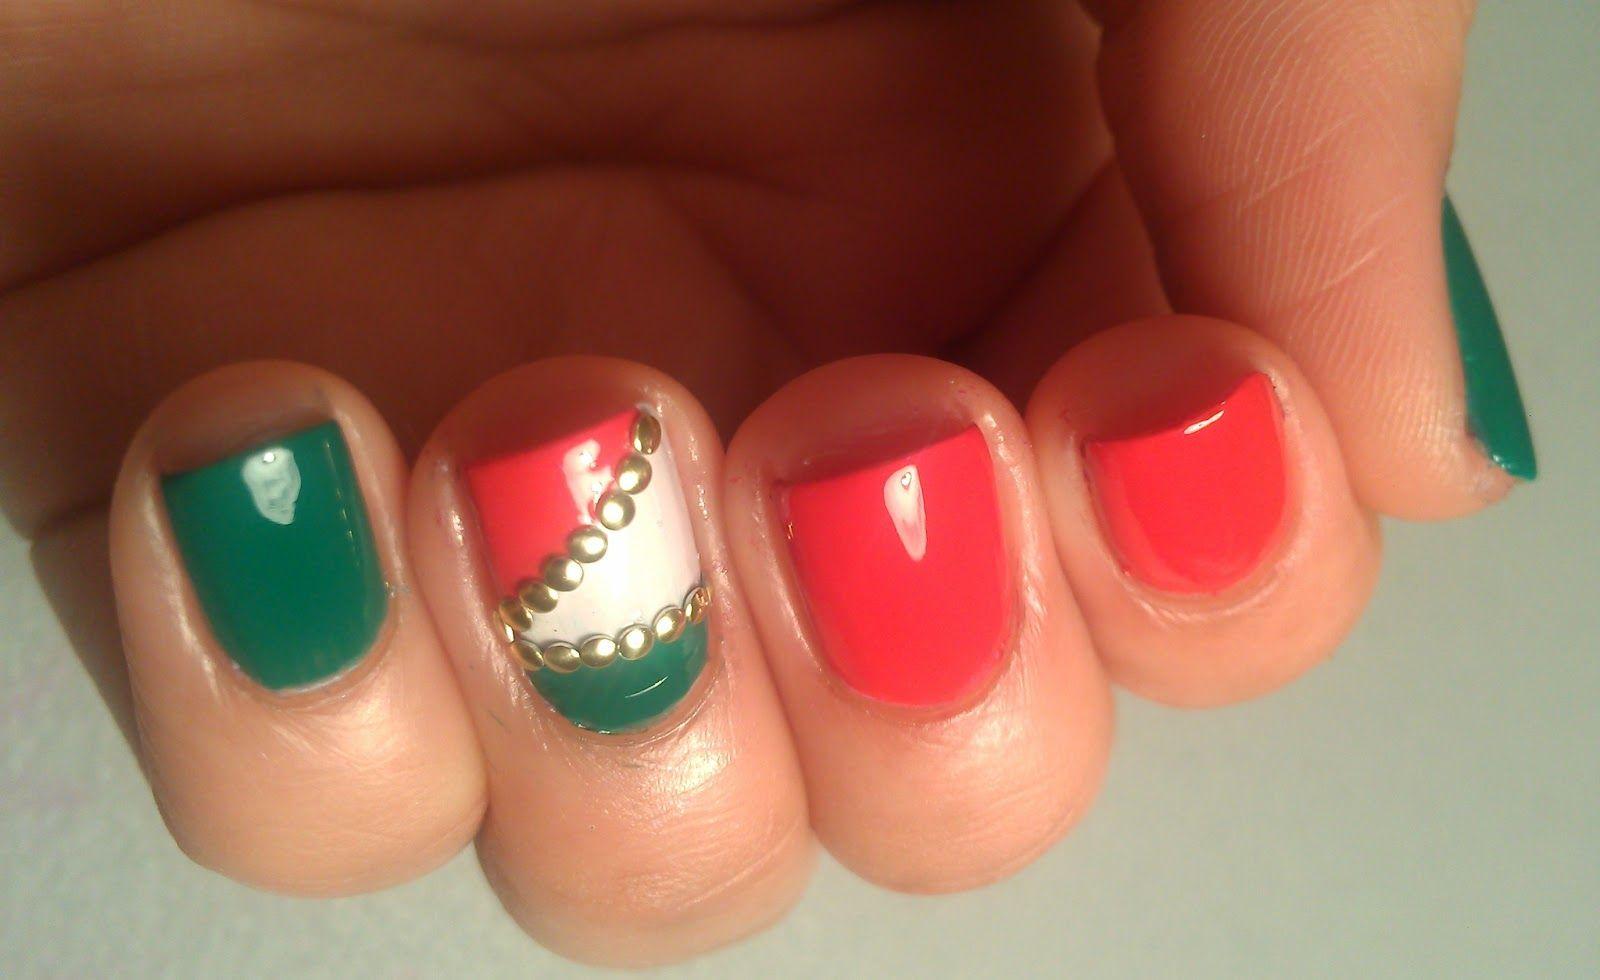 italian flag nails - Google Search | Nail Art | Pinterest | Flag ...